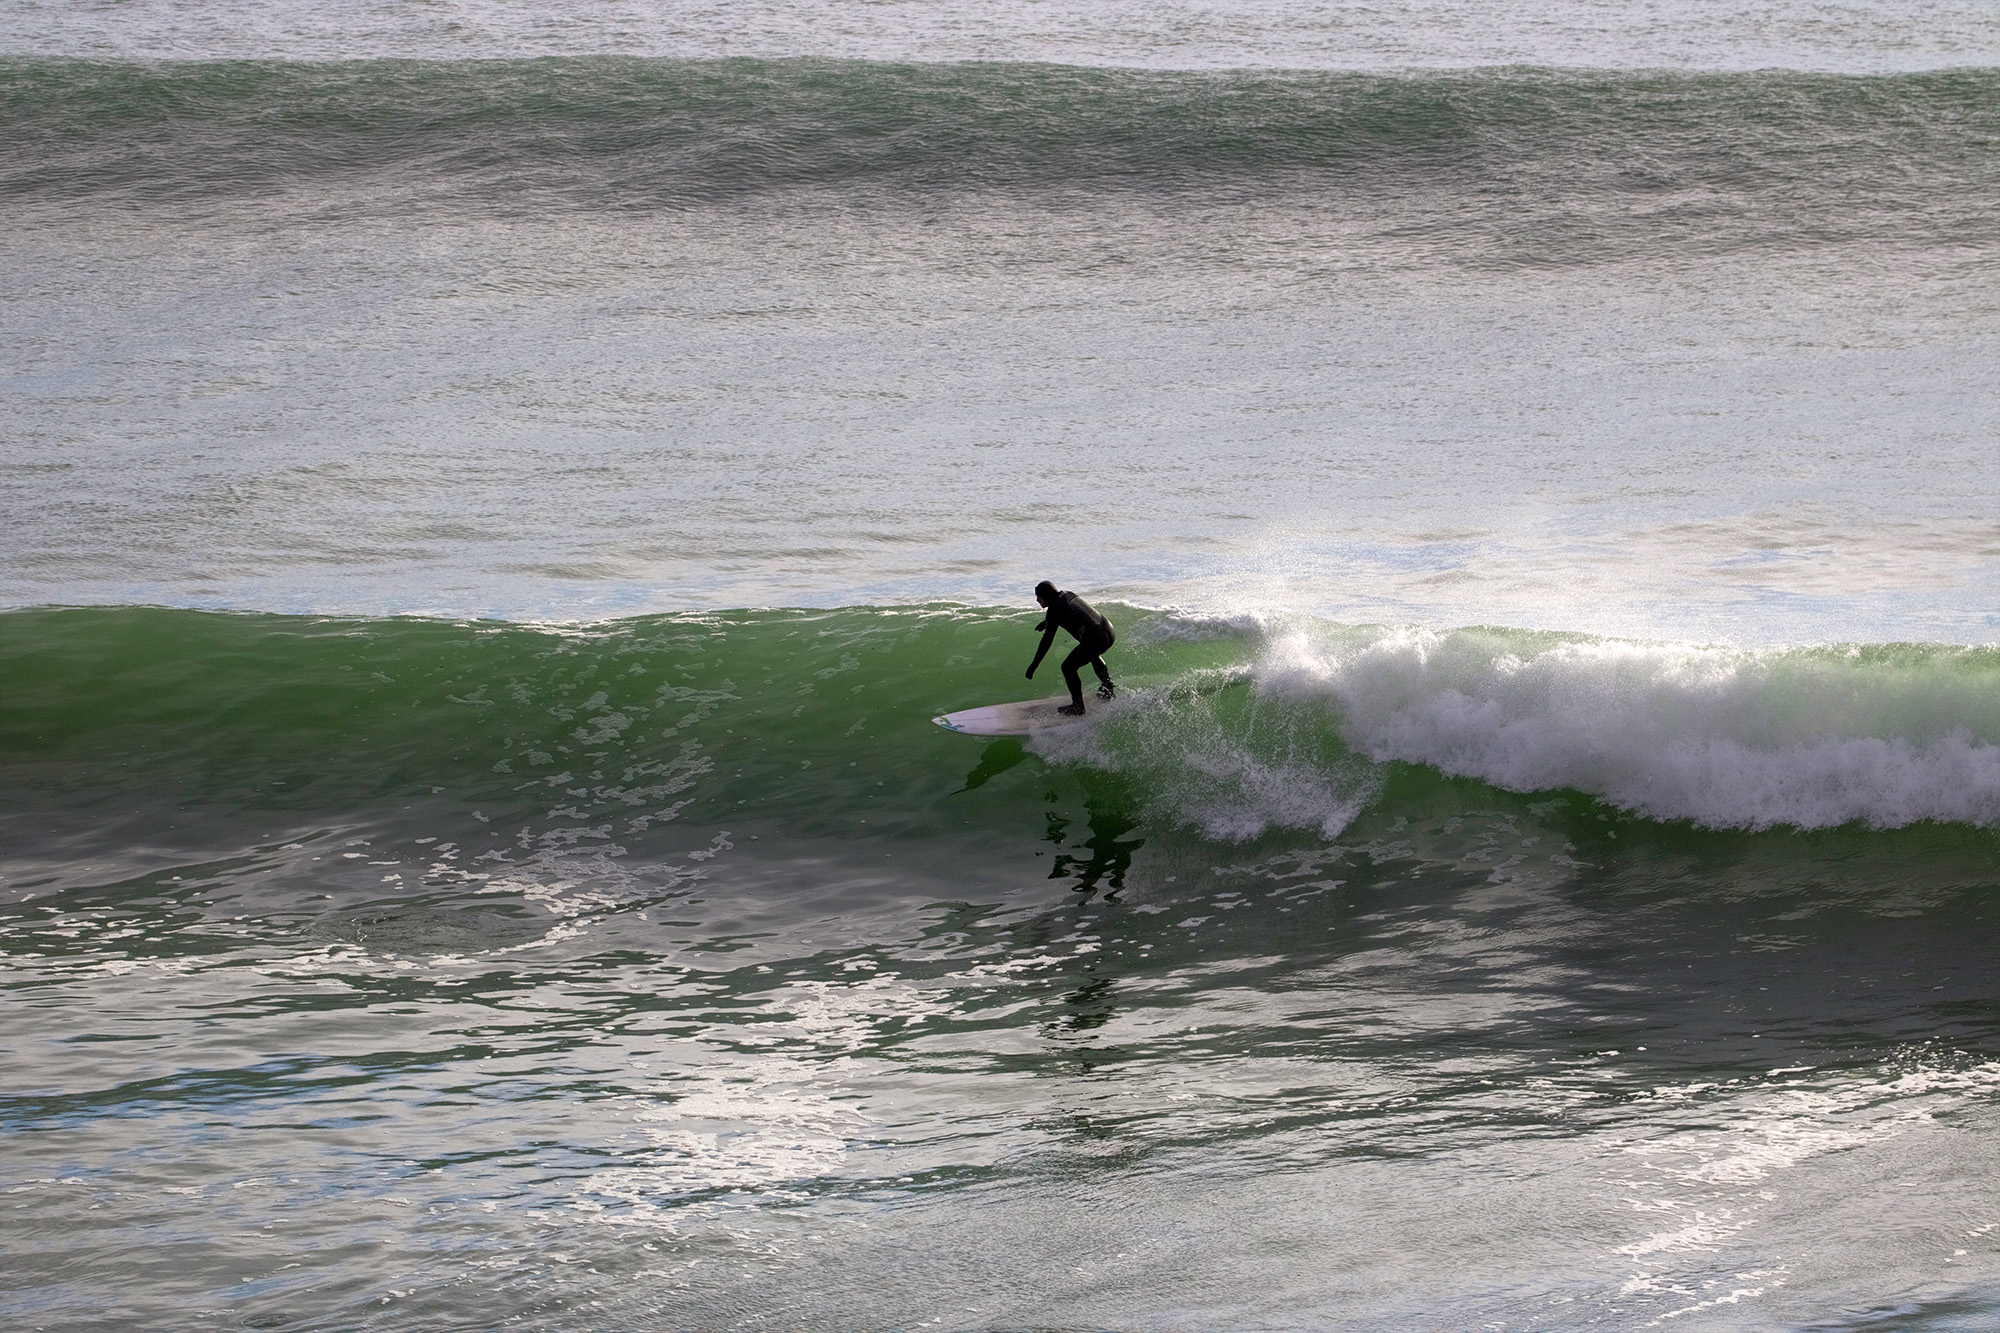 1-19-17 MTK Surfer 7.jpg